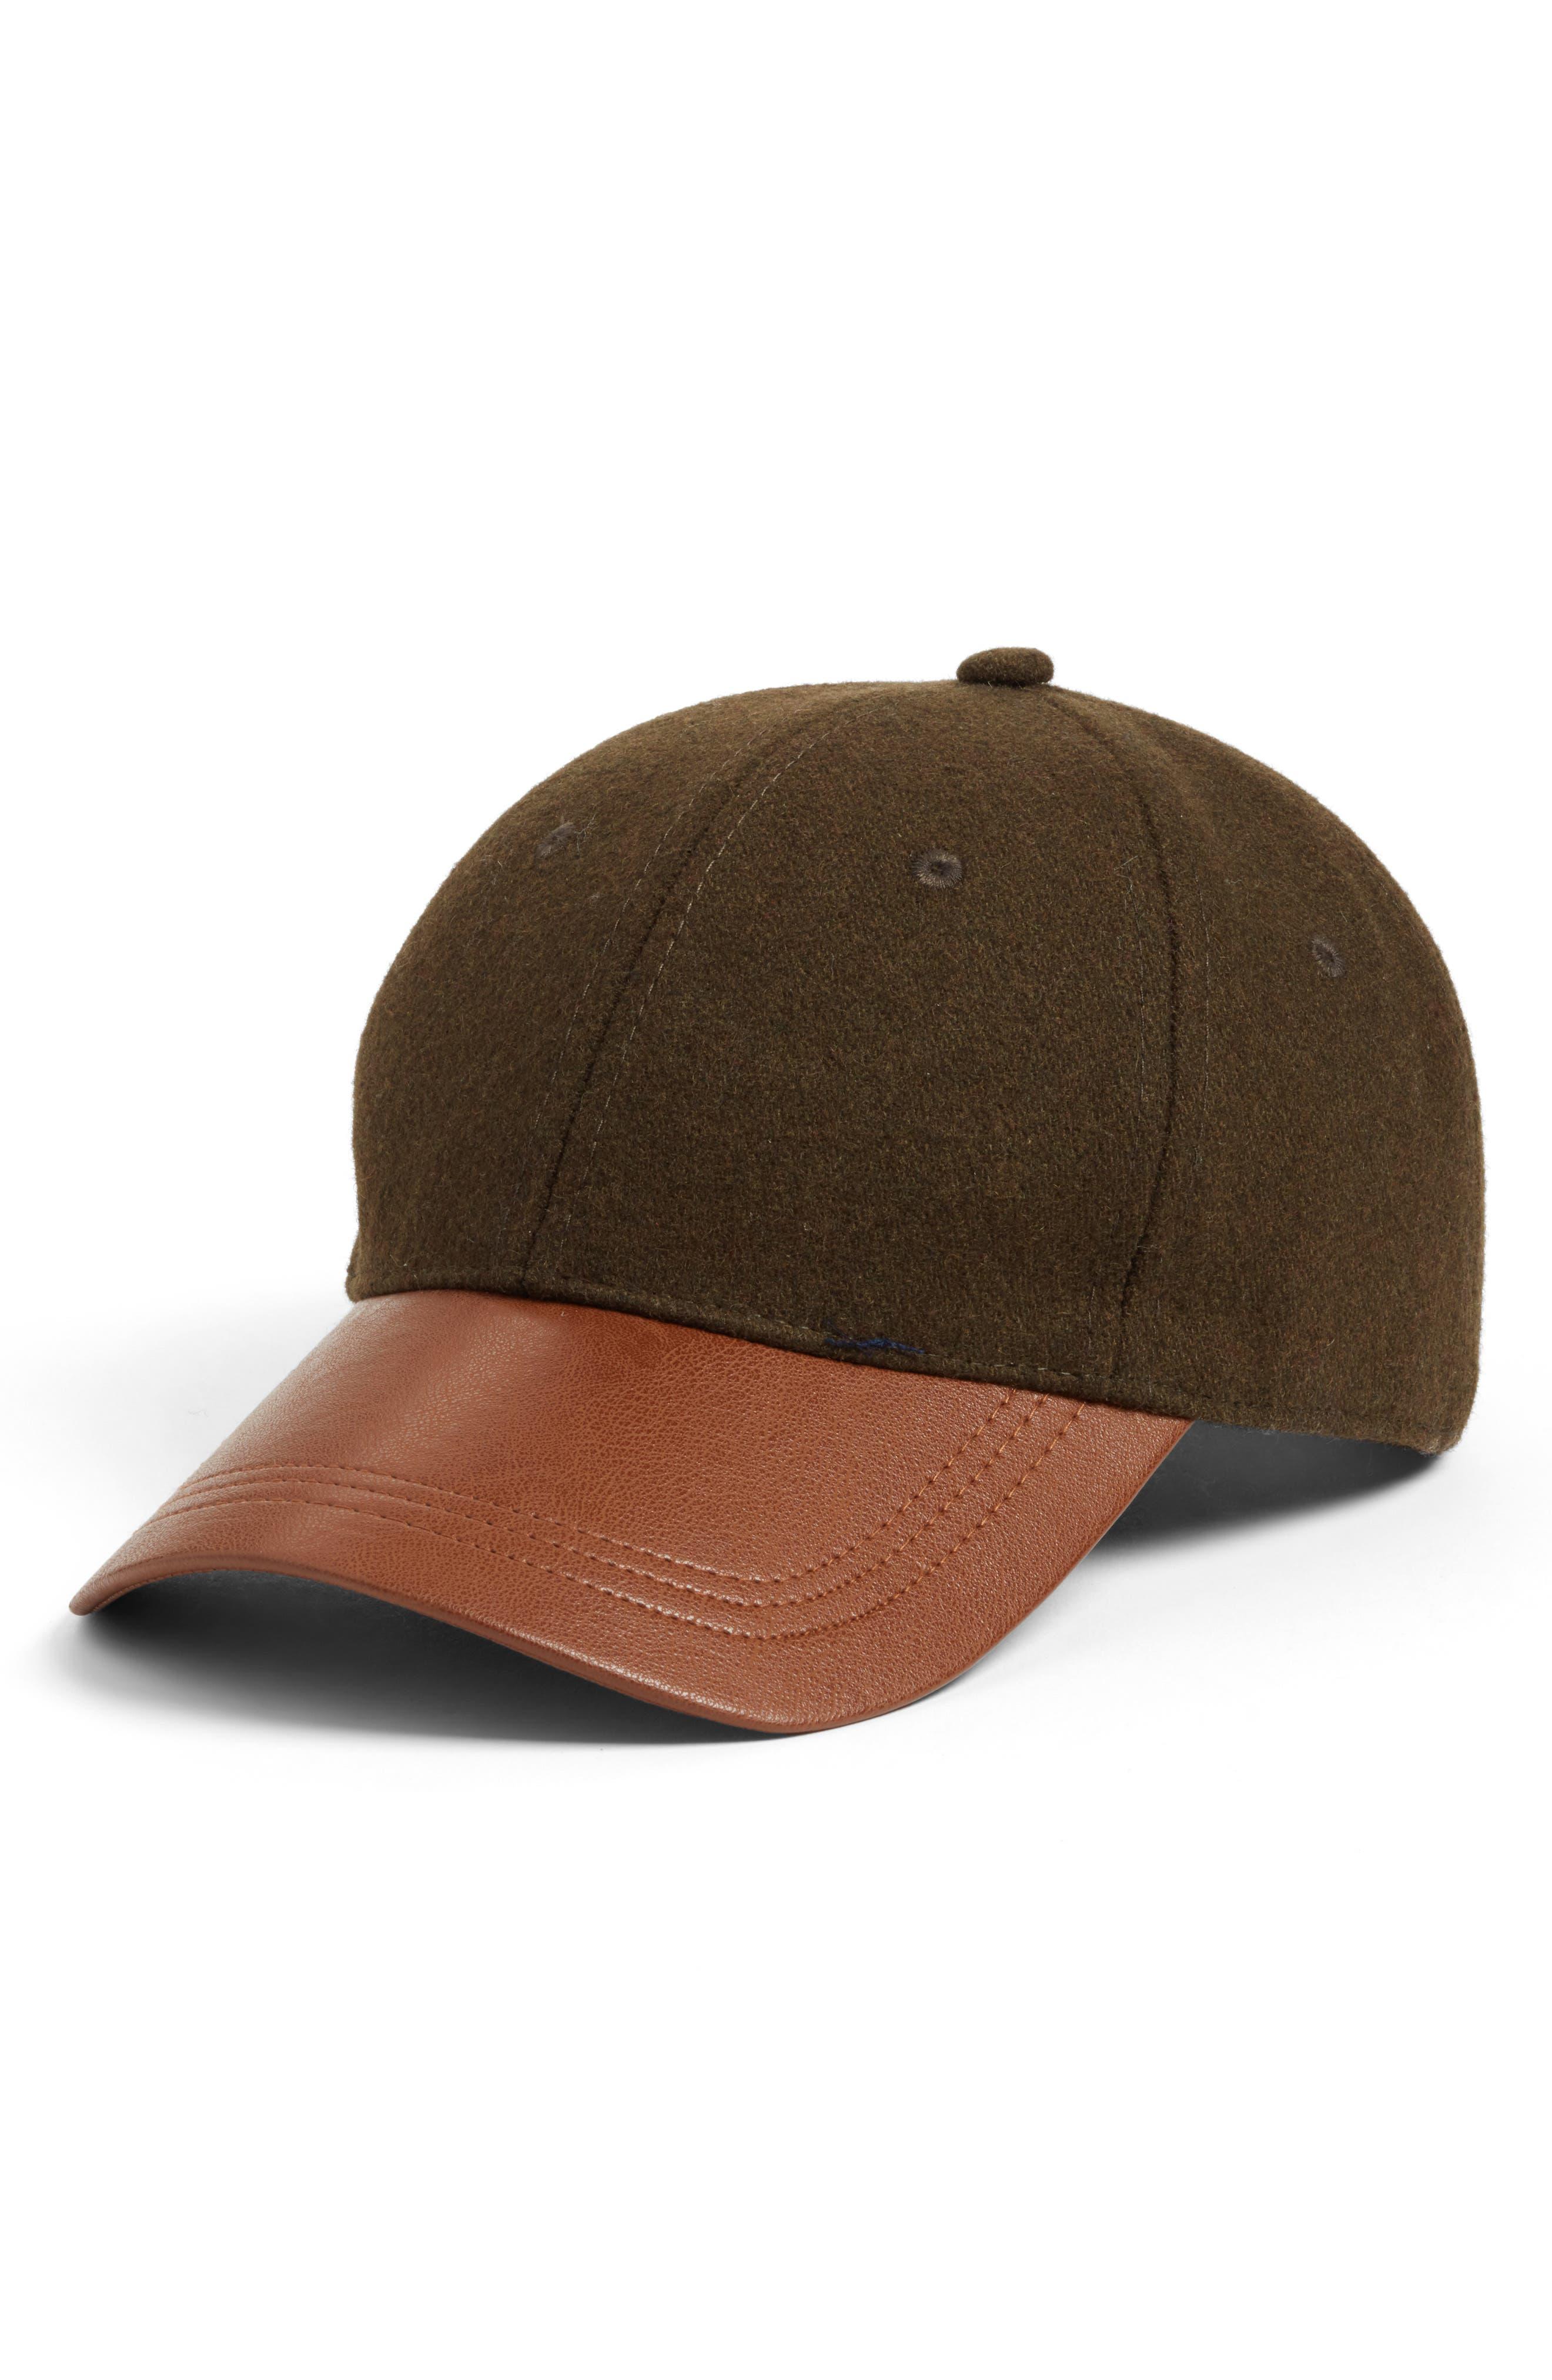 Treasure & Bond Faux Leather Brim Baseball Cap